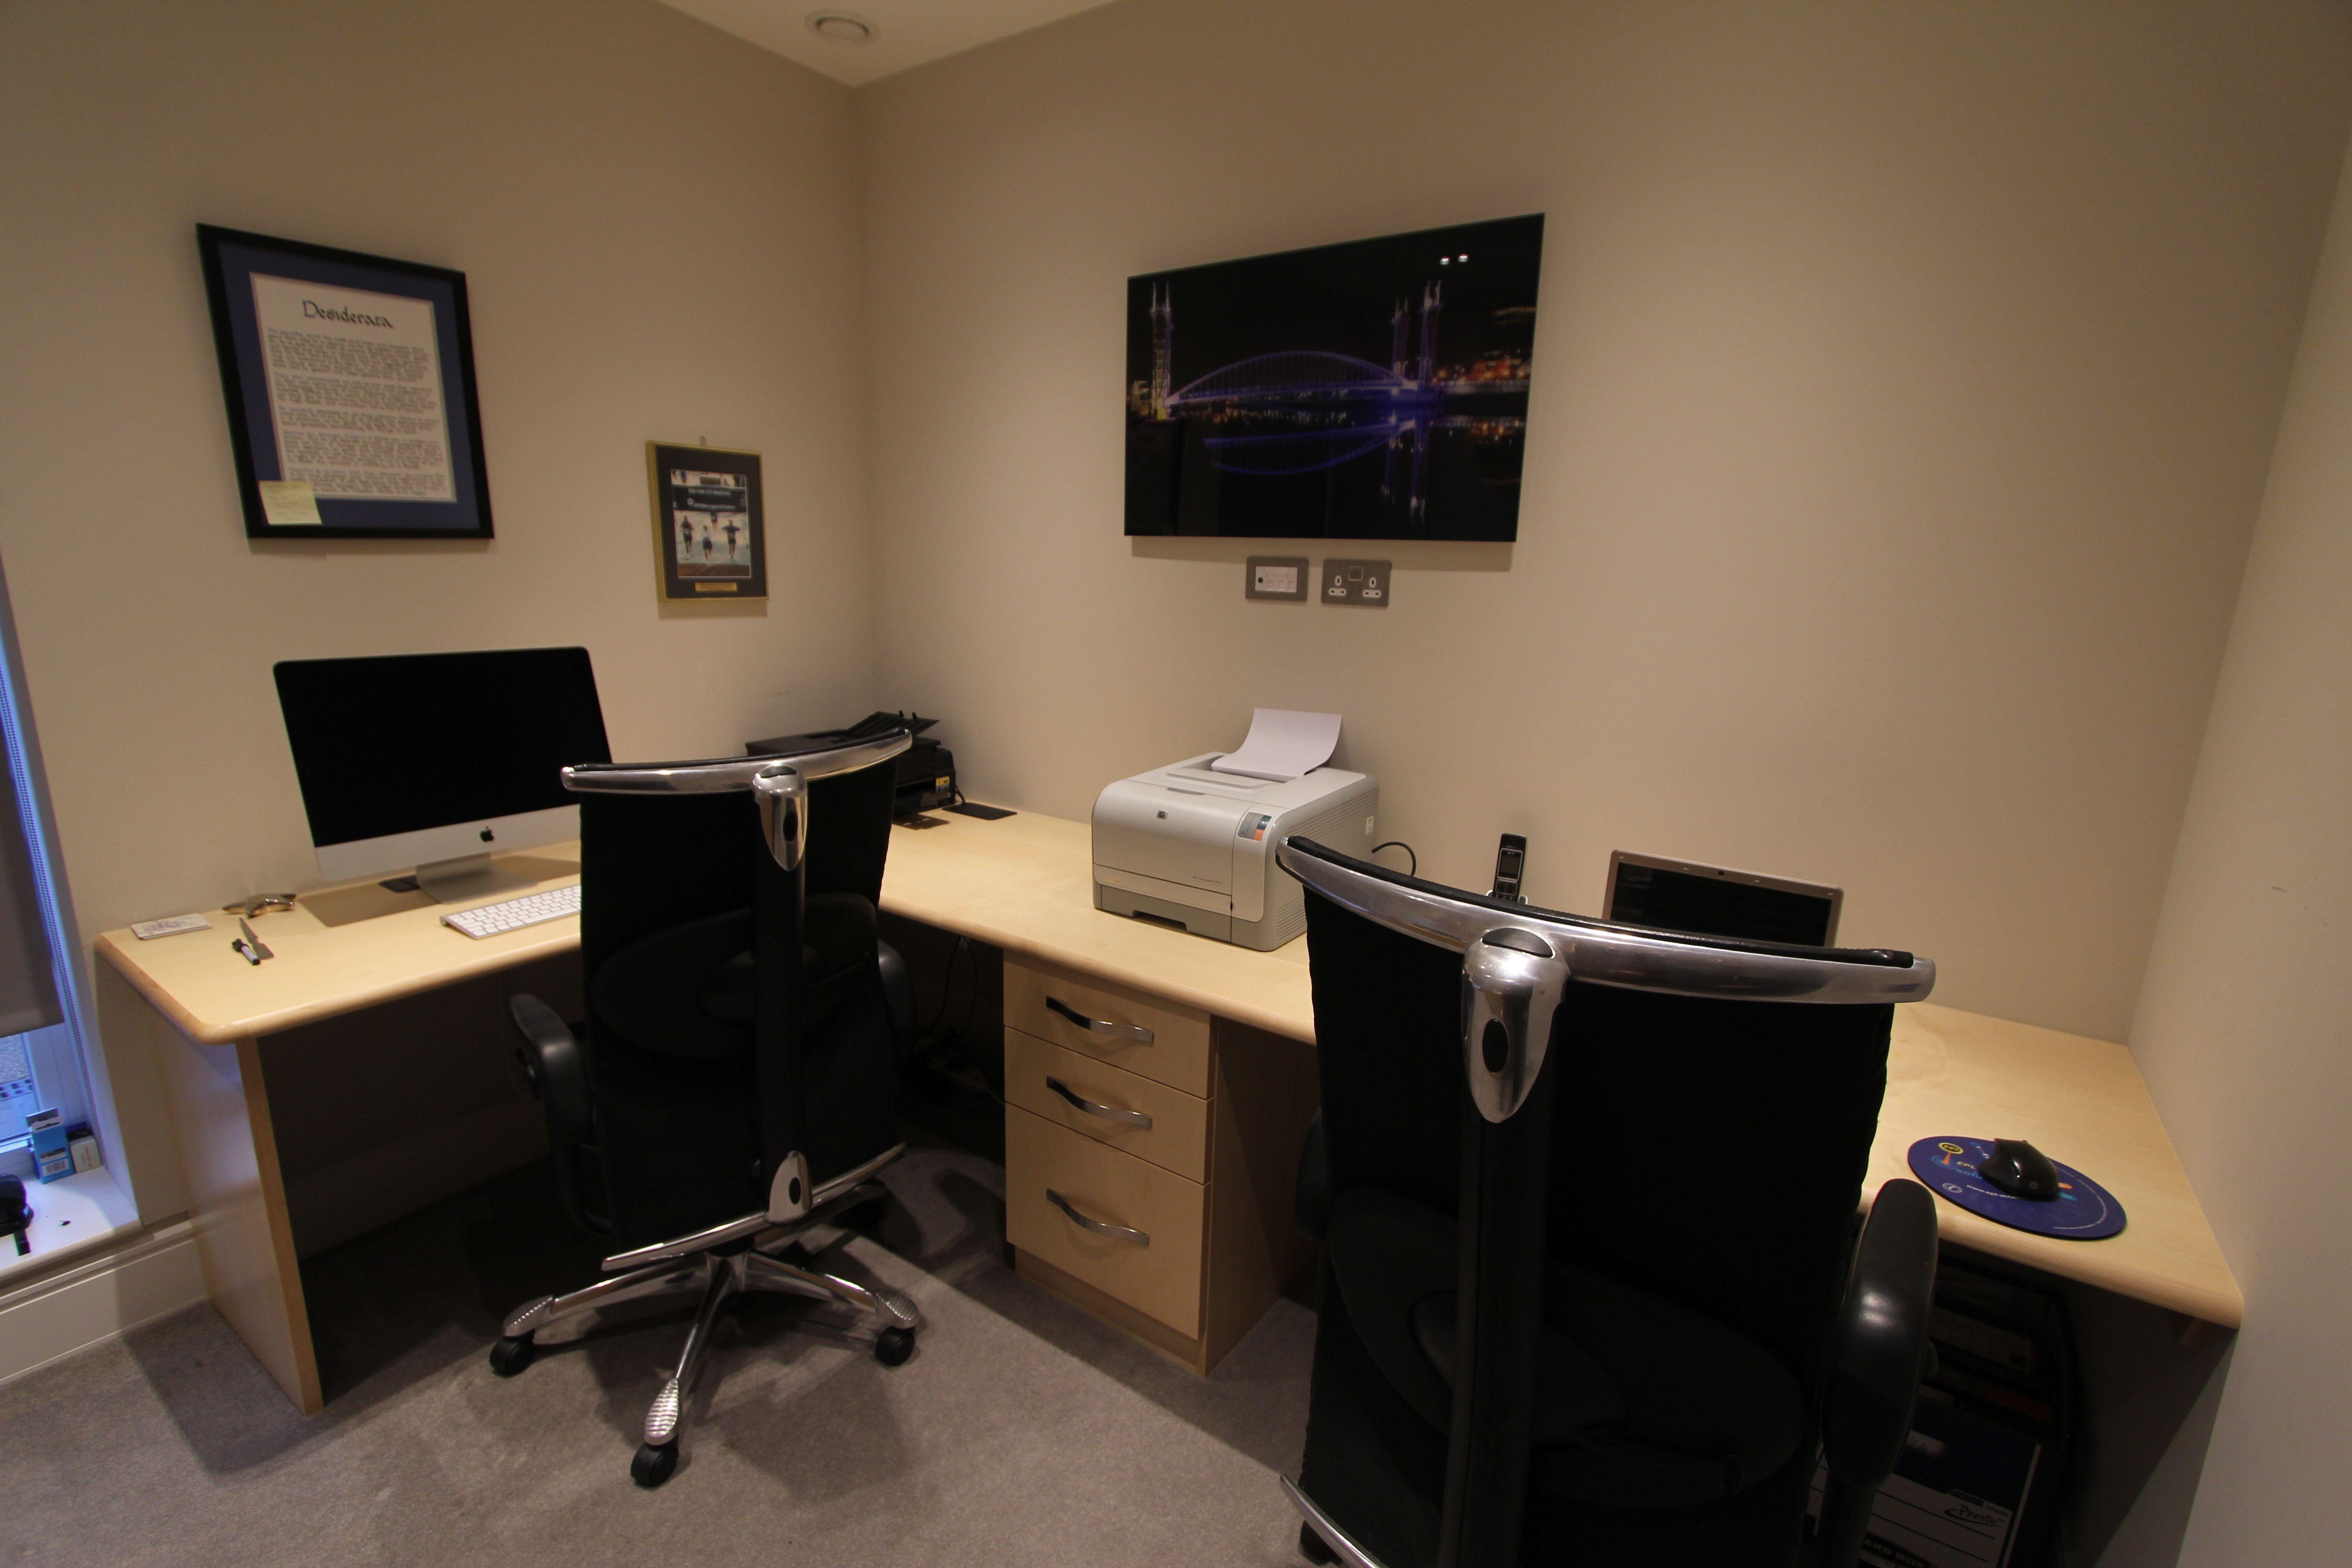 Office Furniture Desks Home Office Arrangement Ideas Small Room